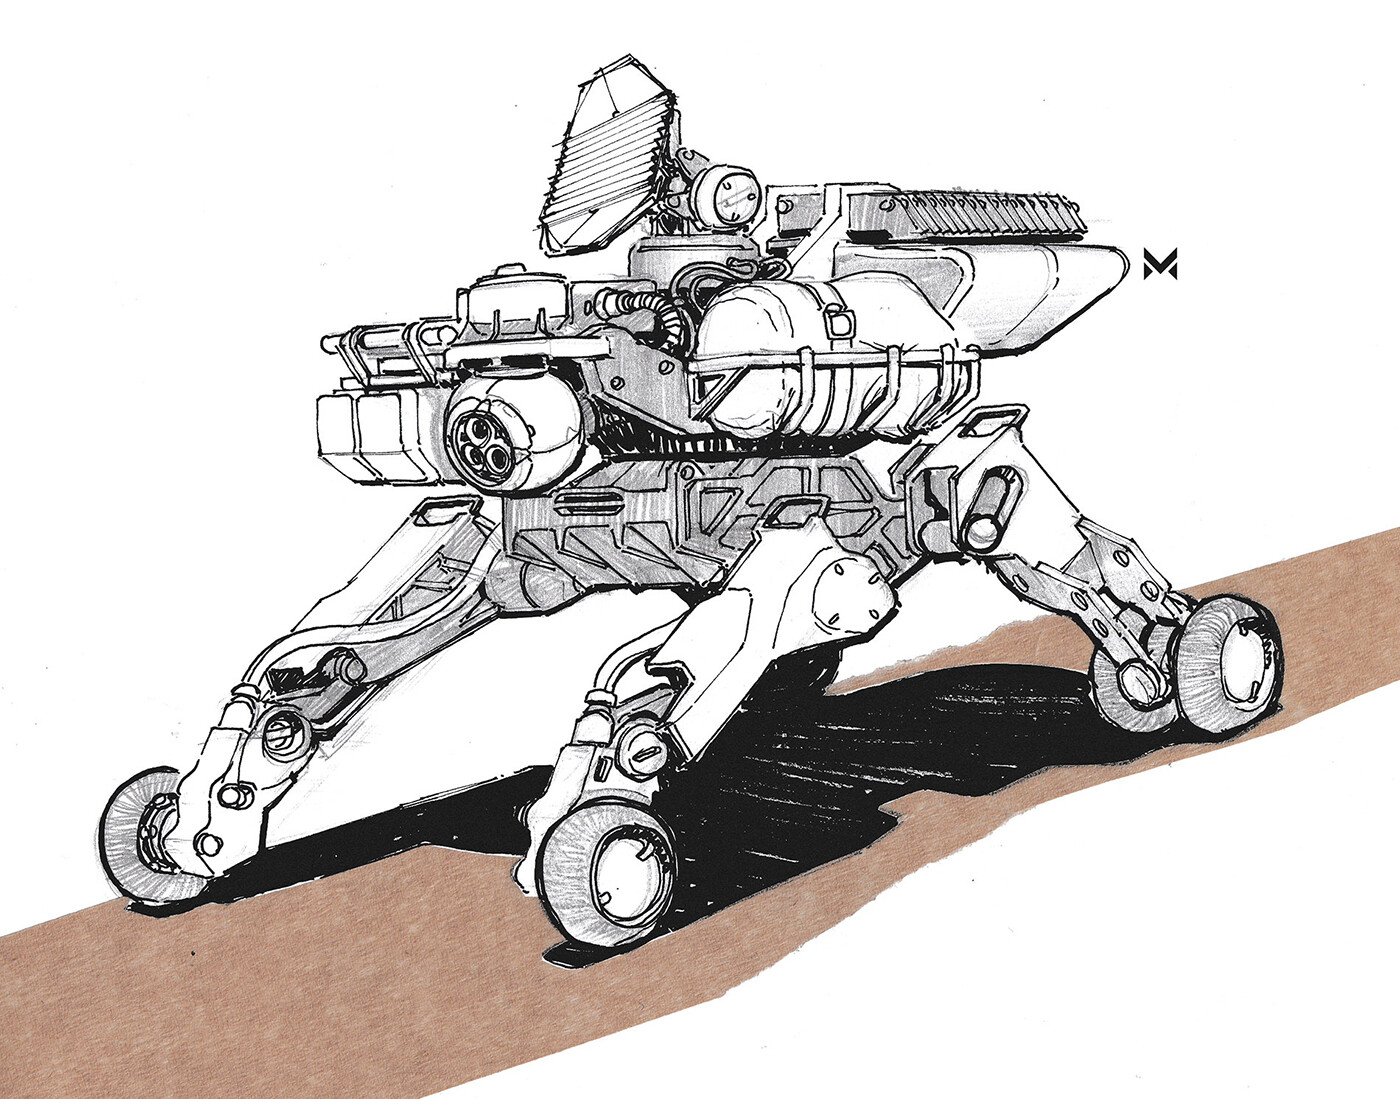 Autonomous exploration rover concept - inspired by the NASA Mars-Rover 'Curiosity'